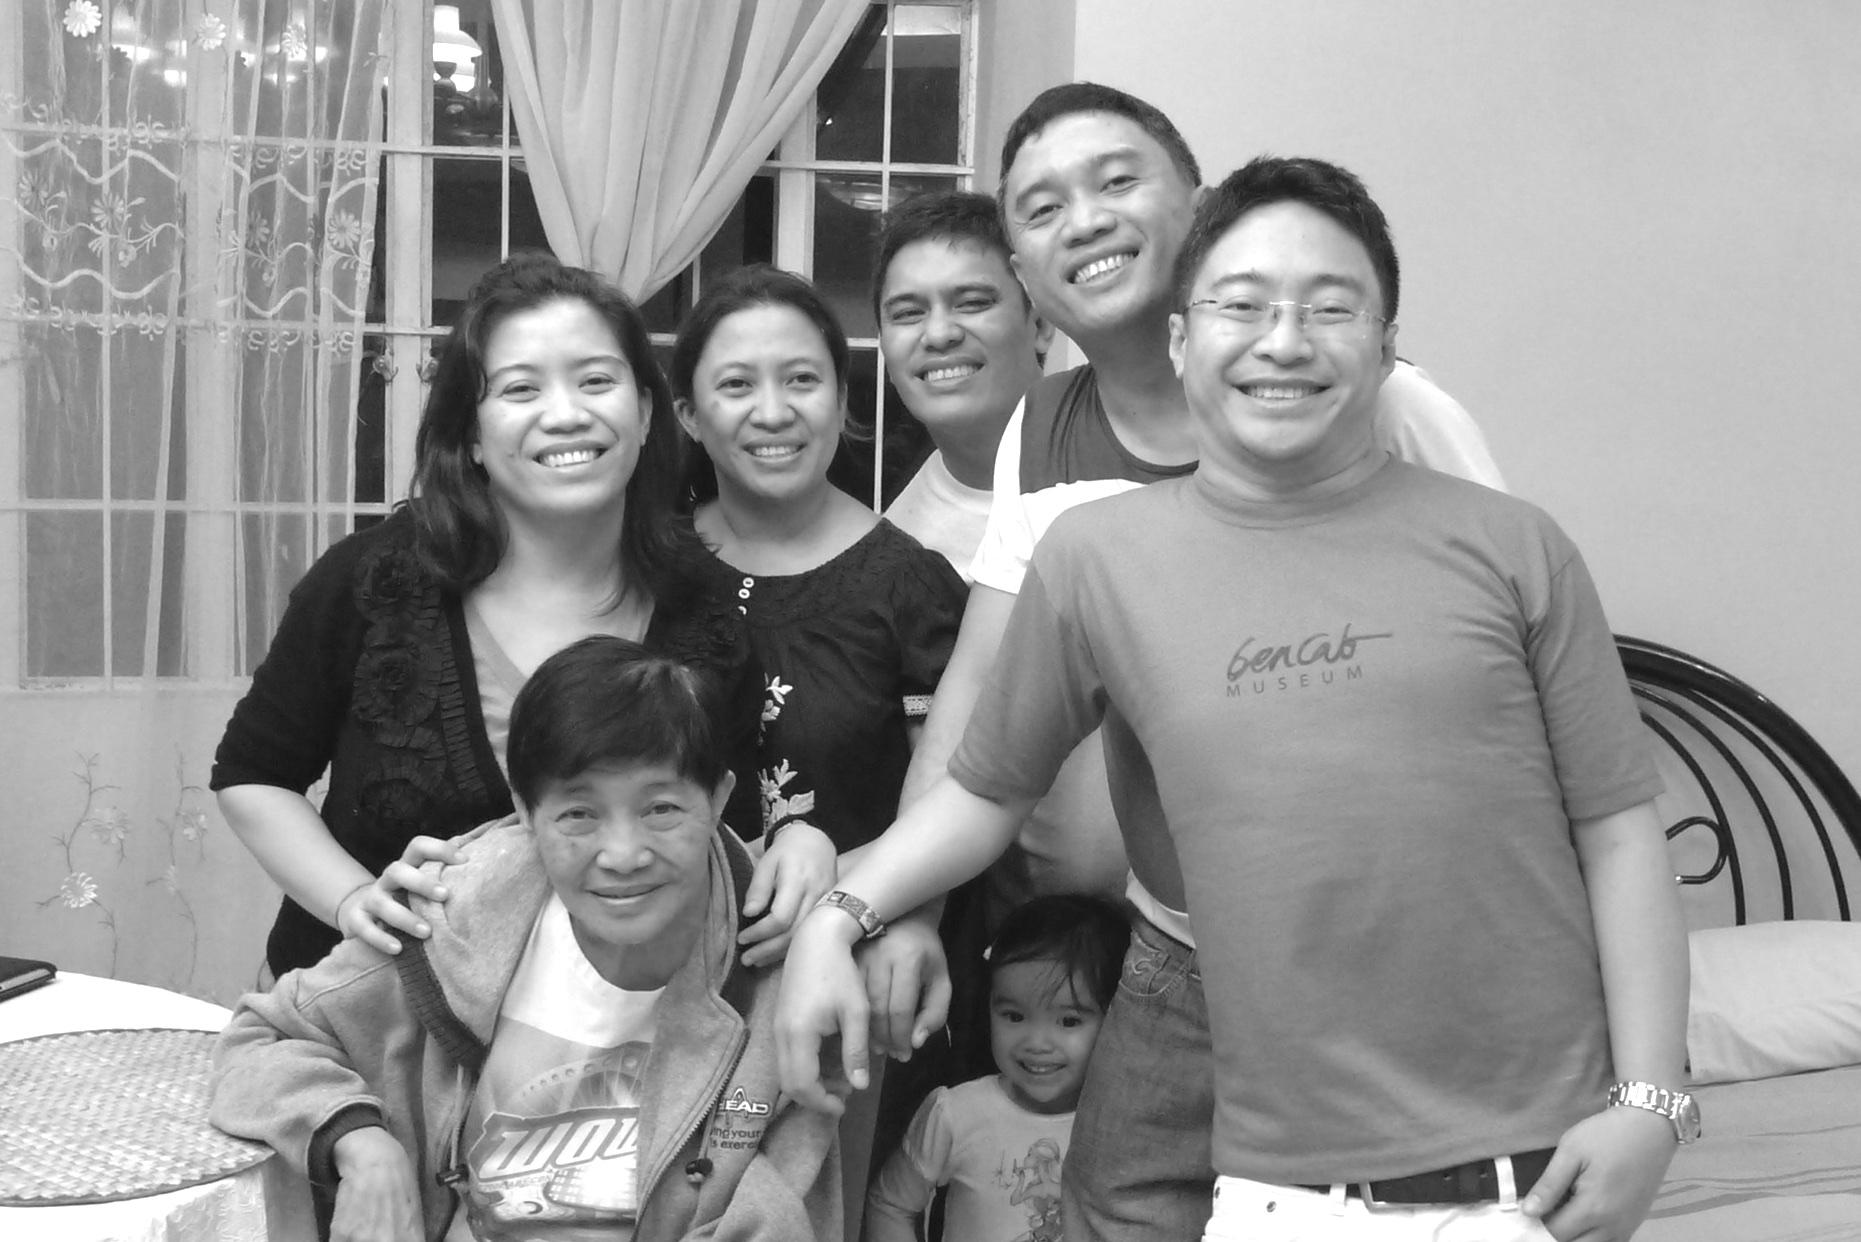 My family on Christmas